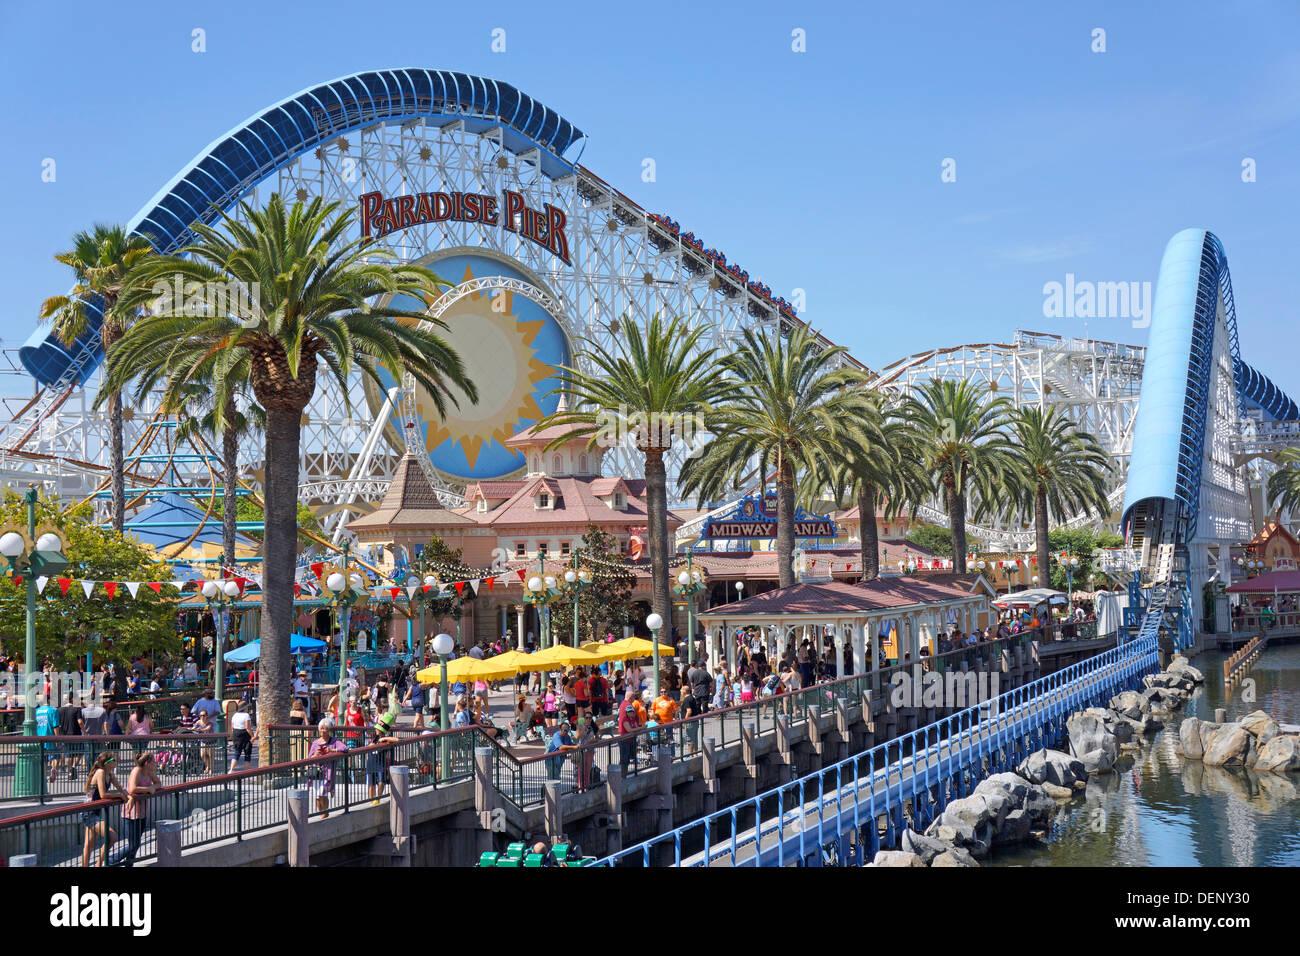 Disneyland Paradise Pier, California Adventure Park, Anaheim California - Stock Image